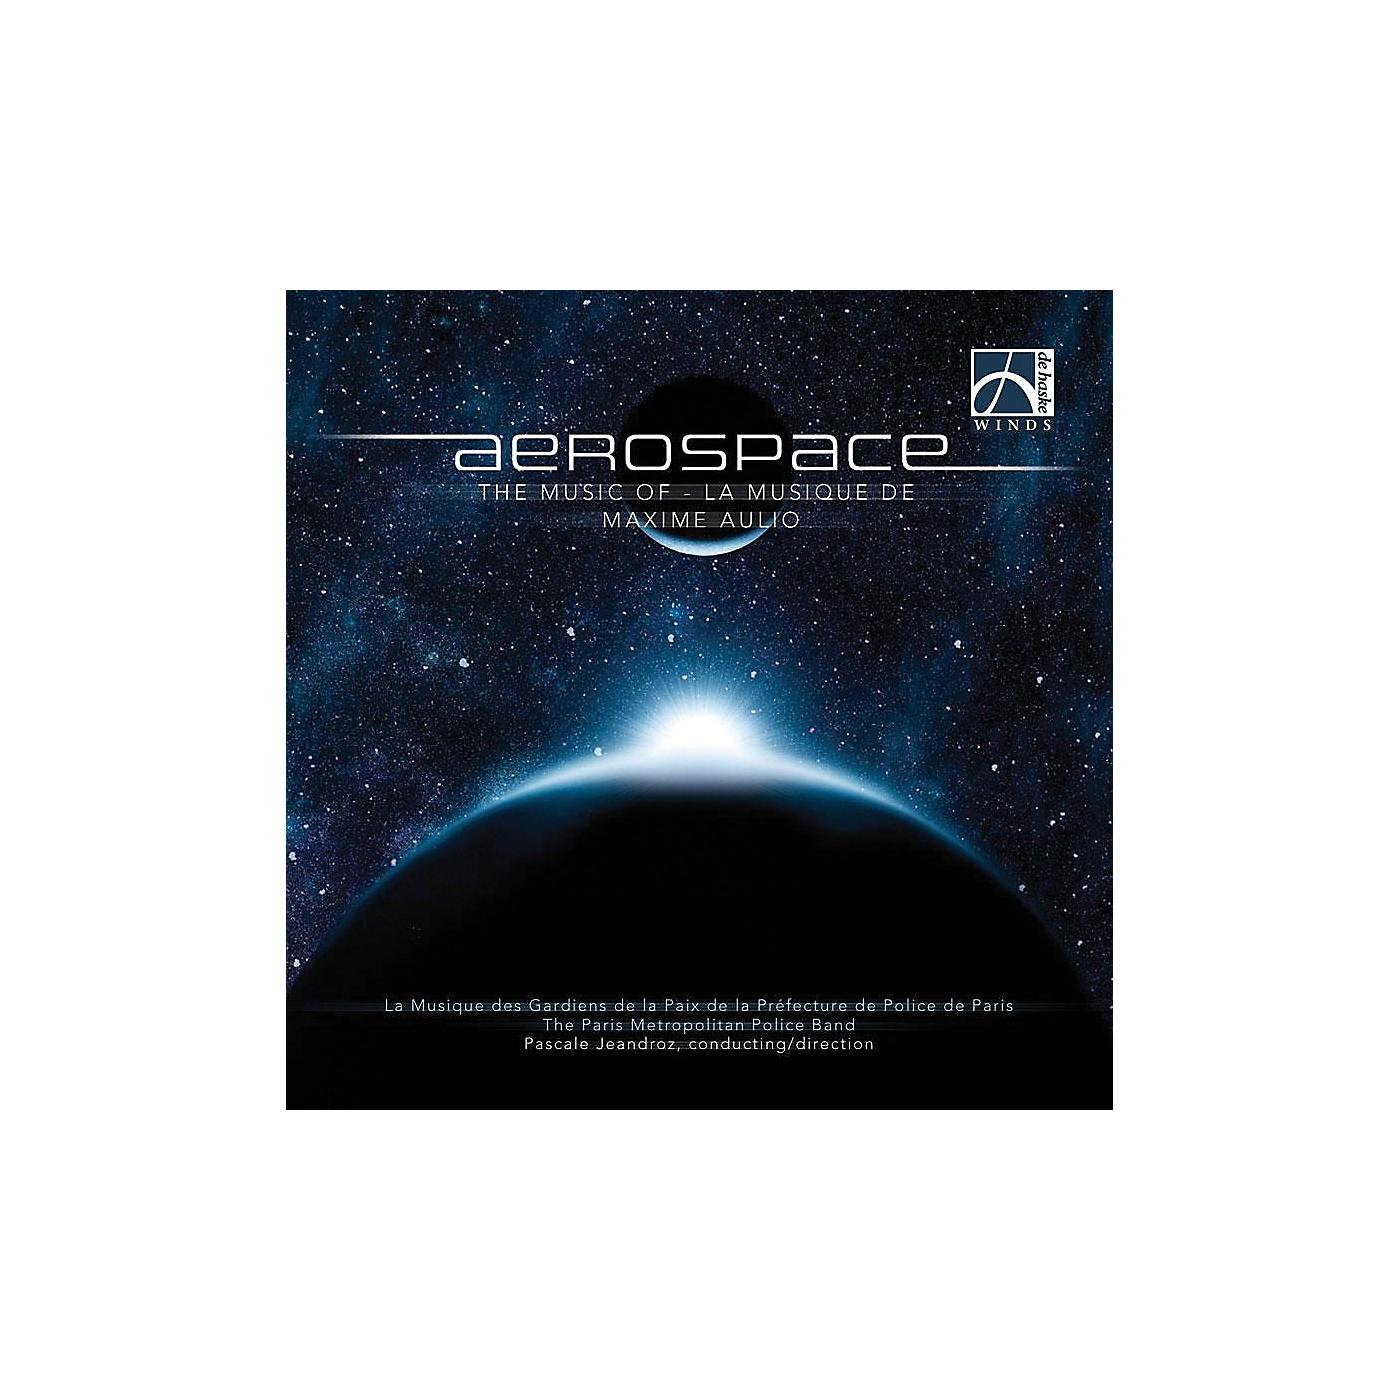 Hal Leonard Aerospace  Cd The Music Of Maxime Aulio Concert Band thumbnail